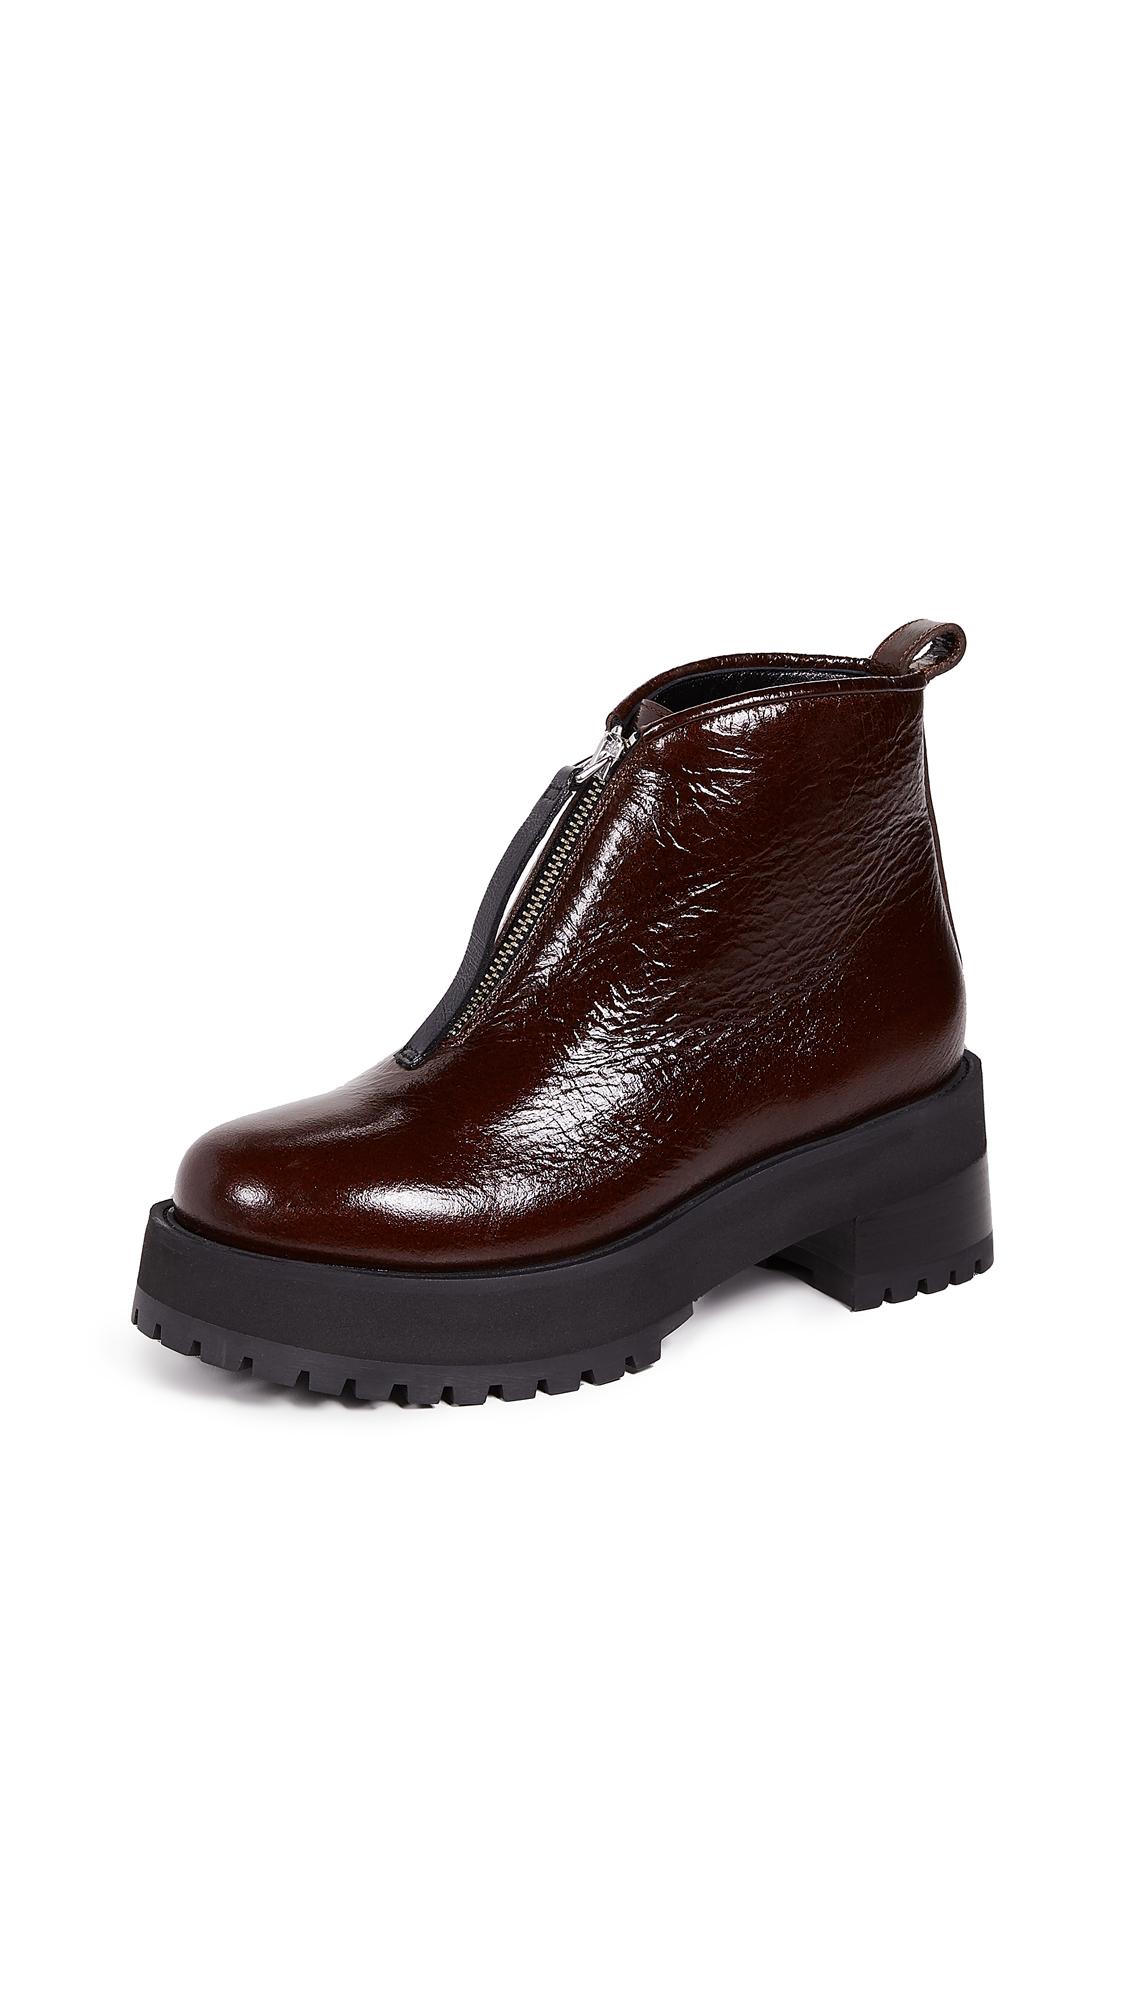 Marni Ankle Boots - Peanut